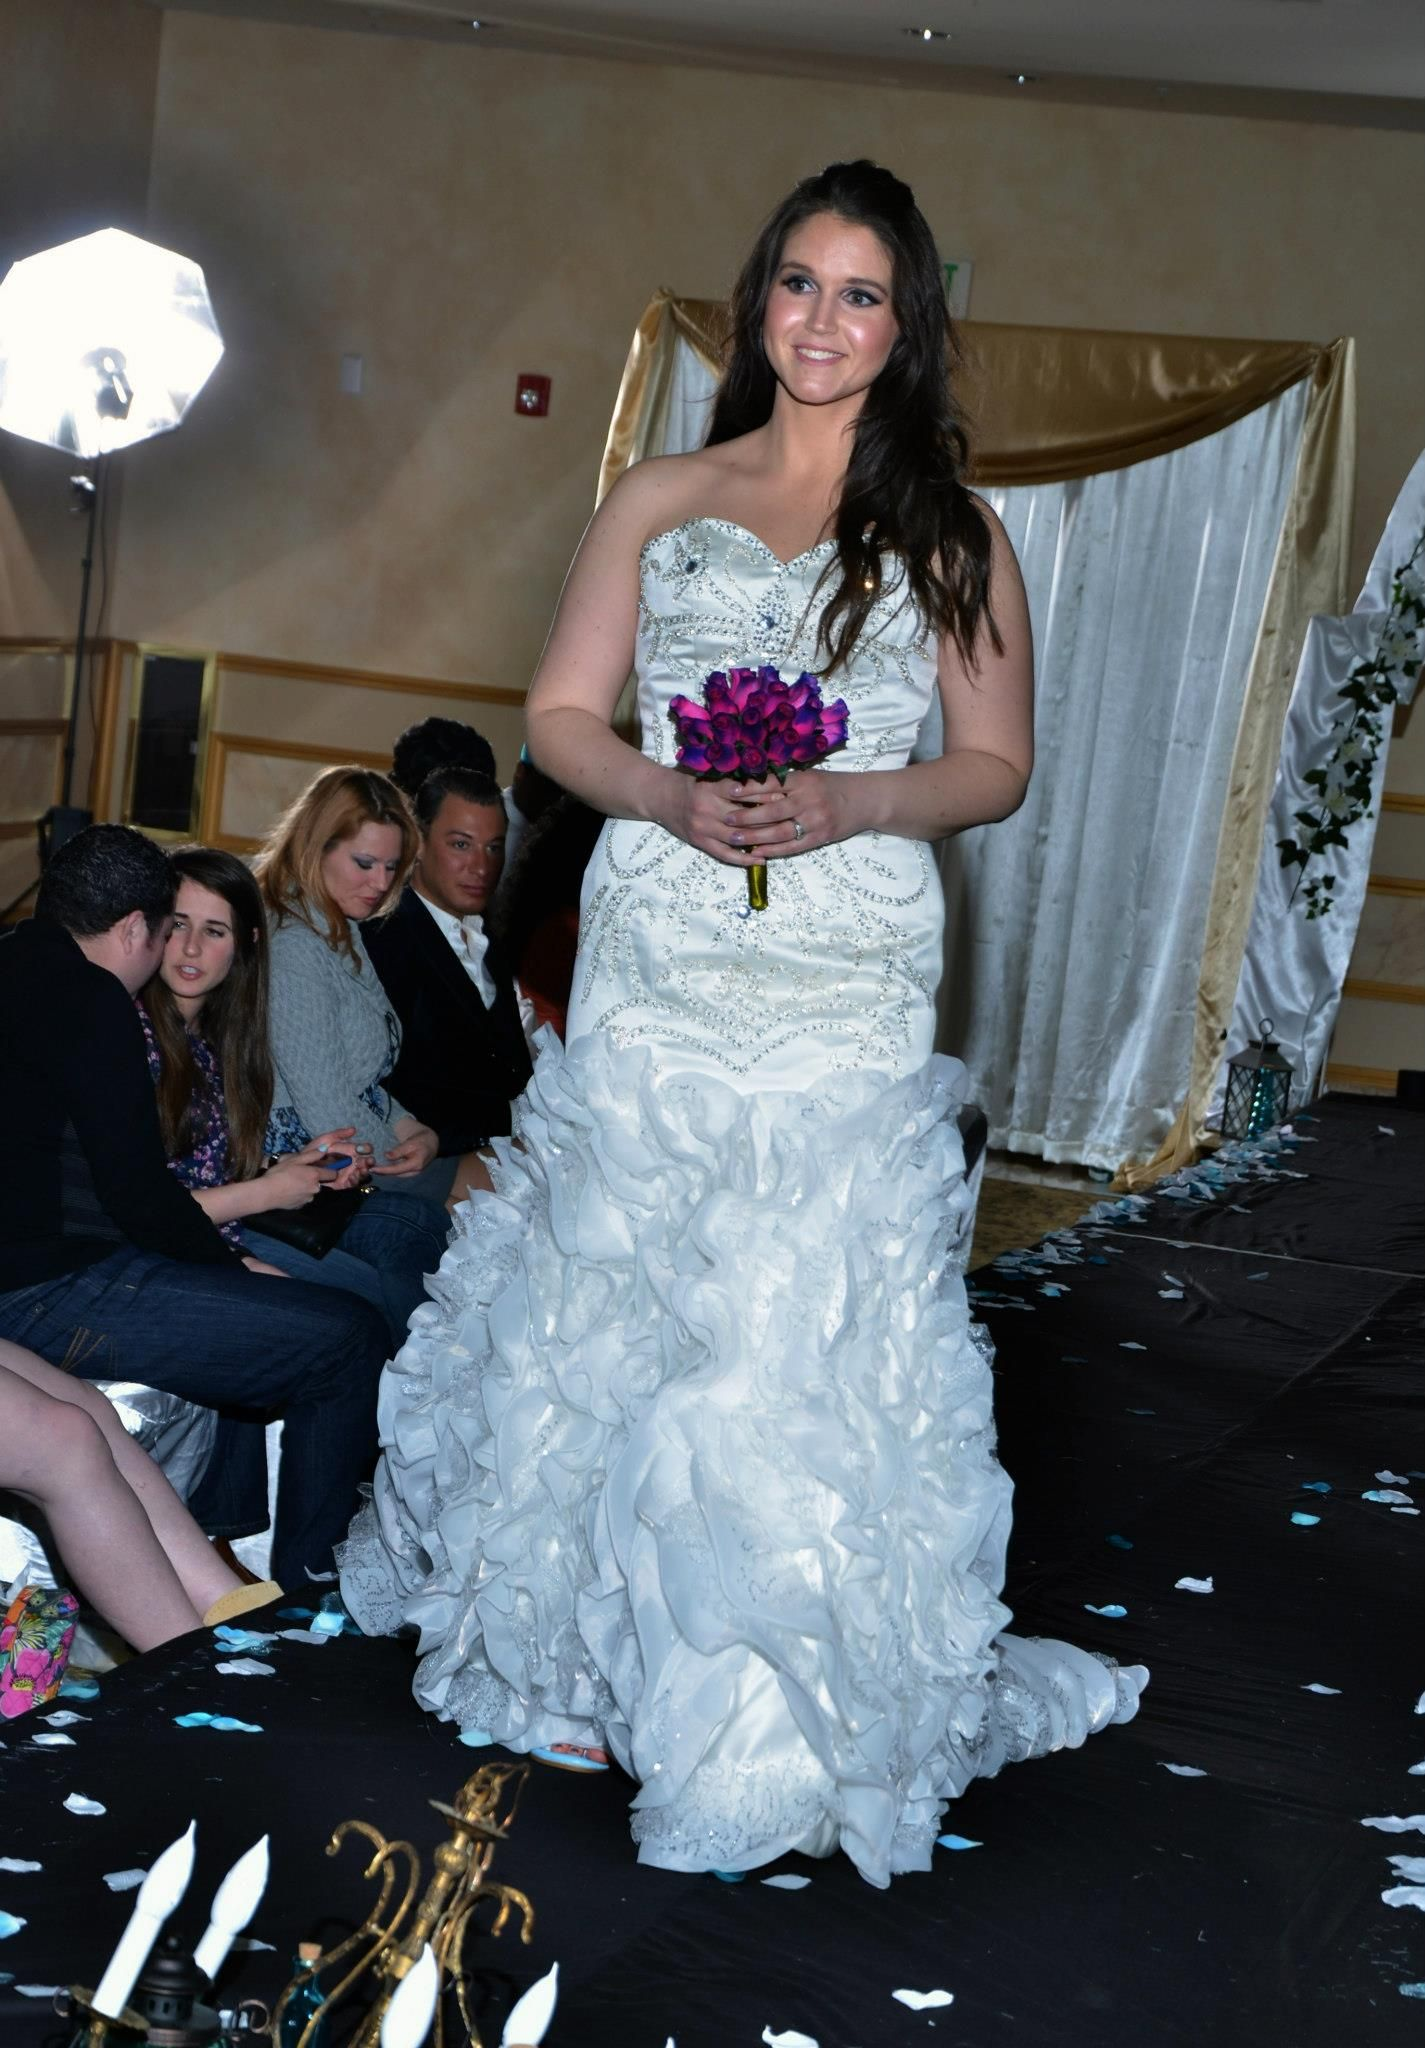 plus size bride on runway www.realsizebride.com \